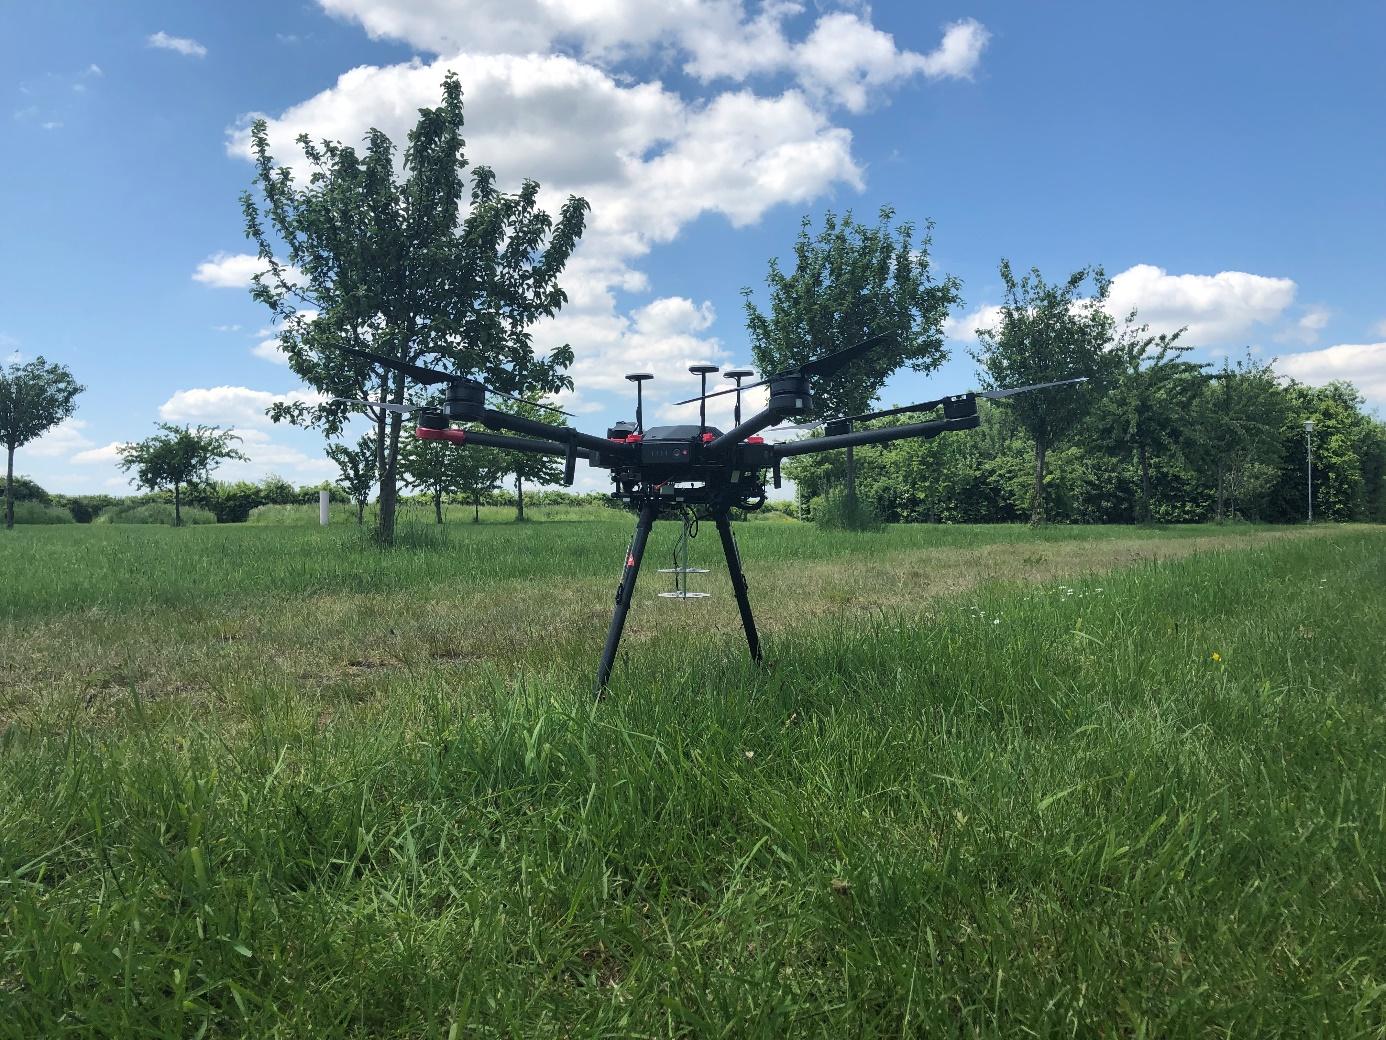 Ten dron ruszy na pomoc ofiarom katastrof